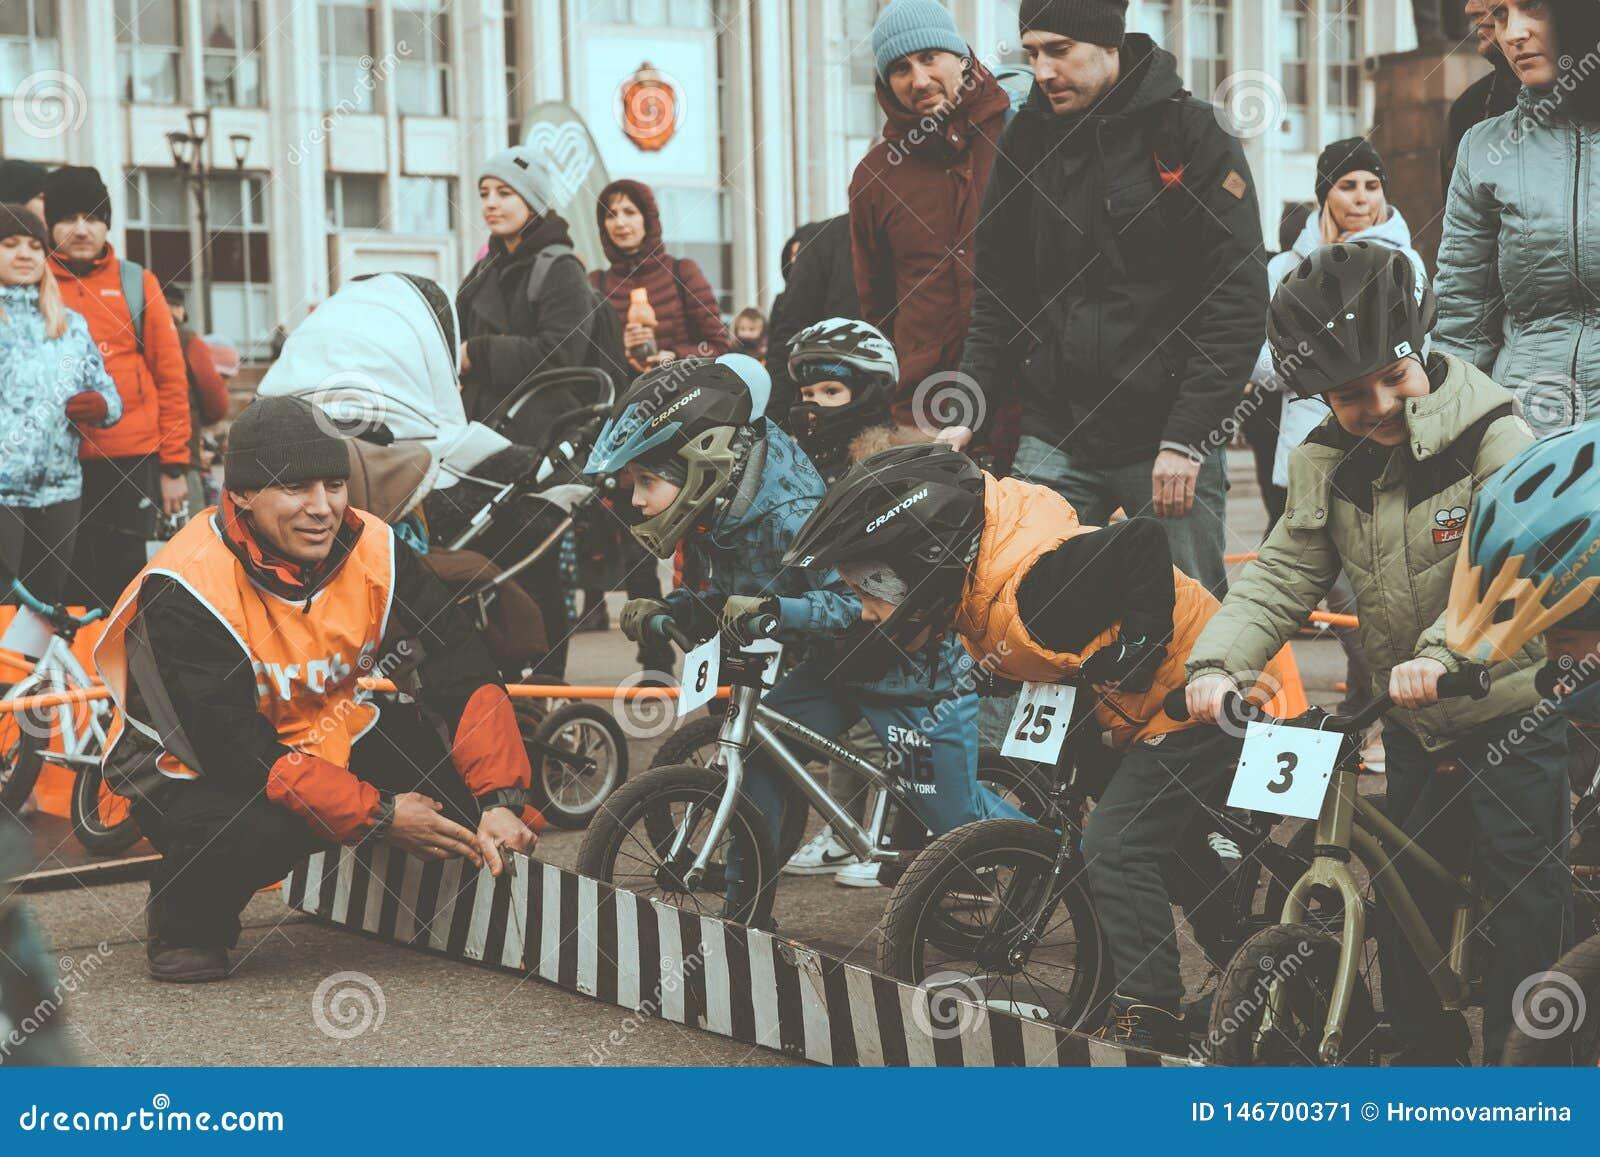 A competi??o amadora das crian?as equilibrar a bicicleta no quadrado de Lenin, grupo de Reade vai